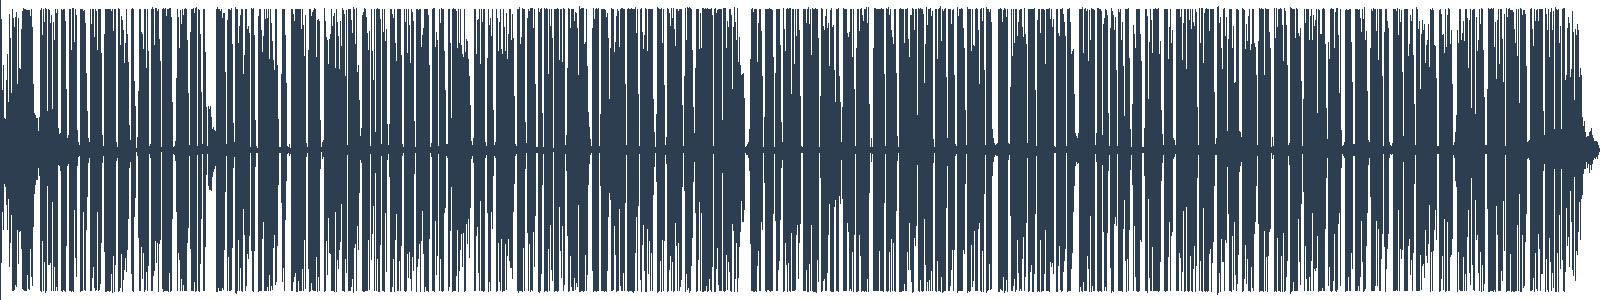 #24 Svetová dráma po roku 1945 (Maturita s Hashtagom) waveform